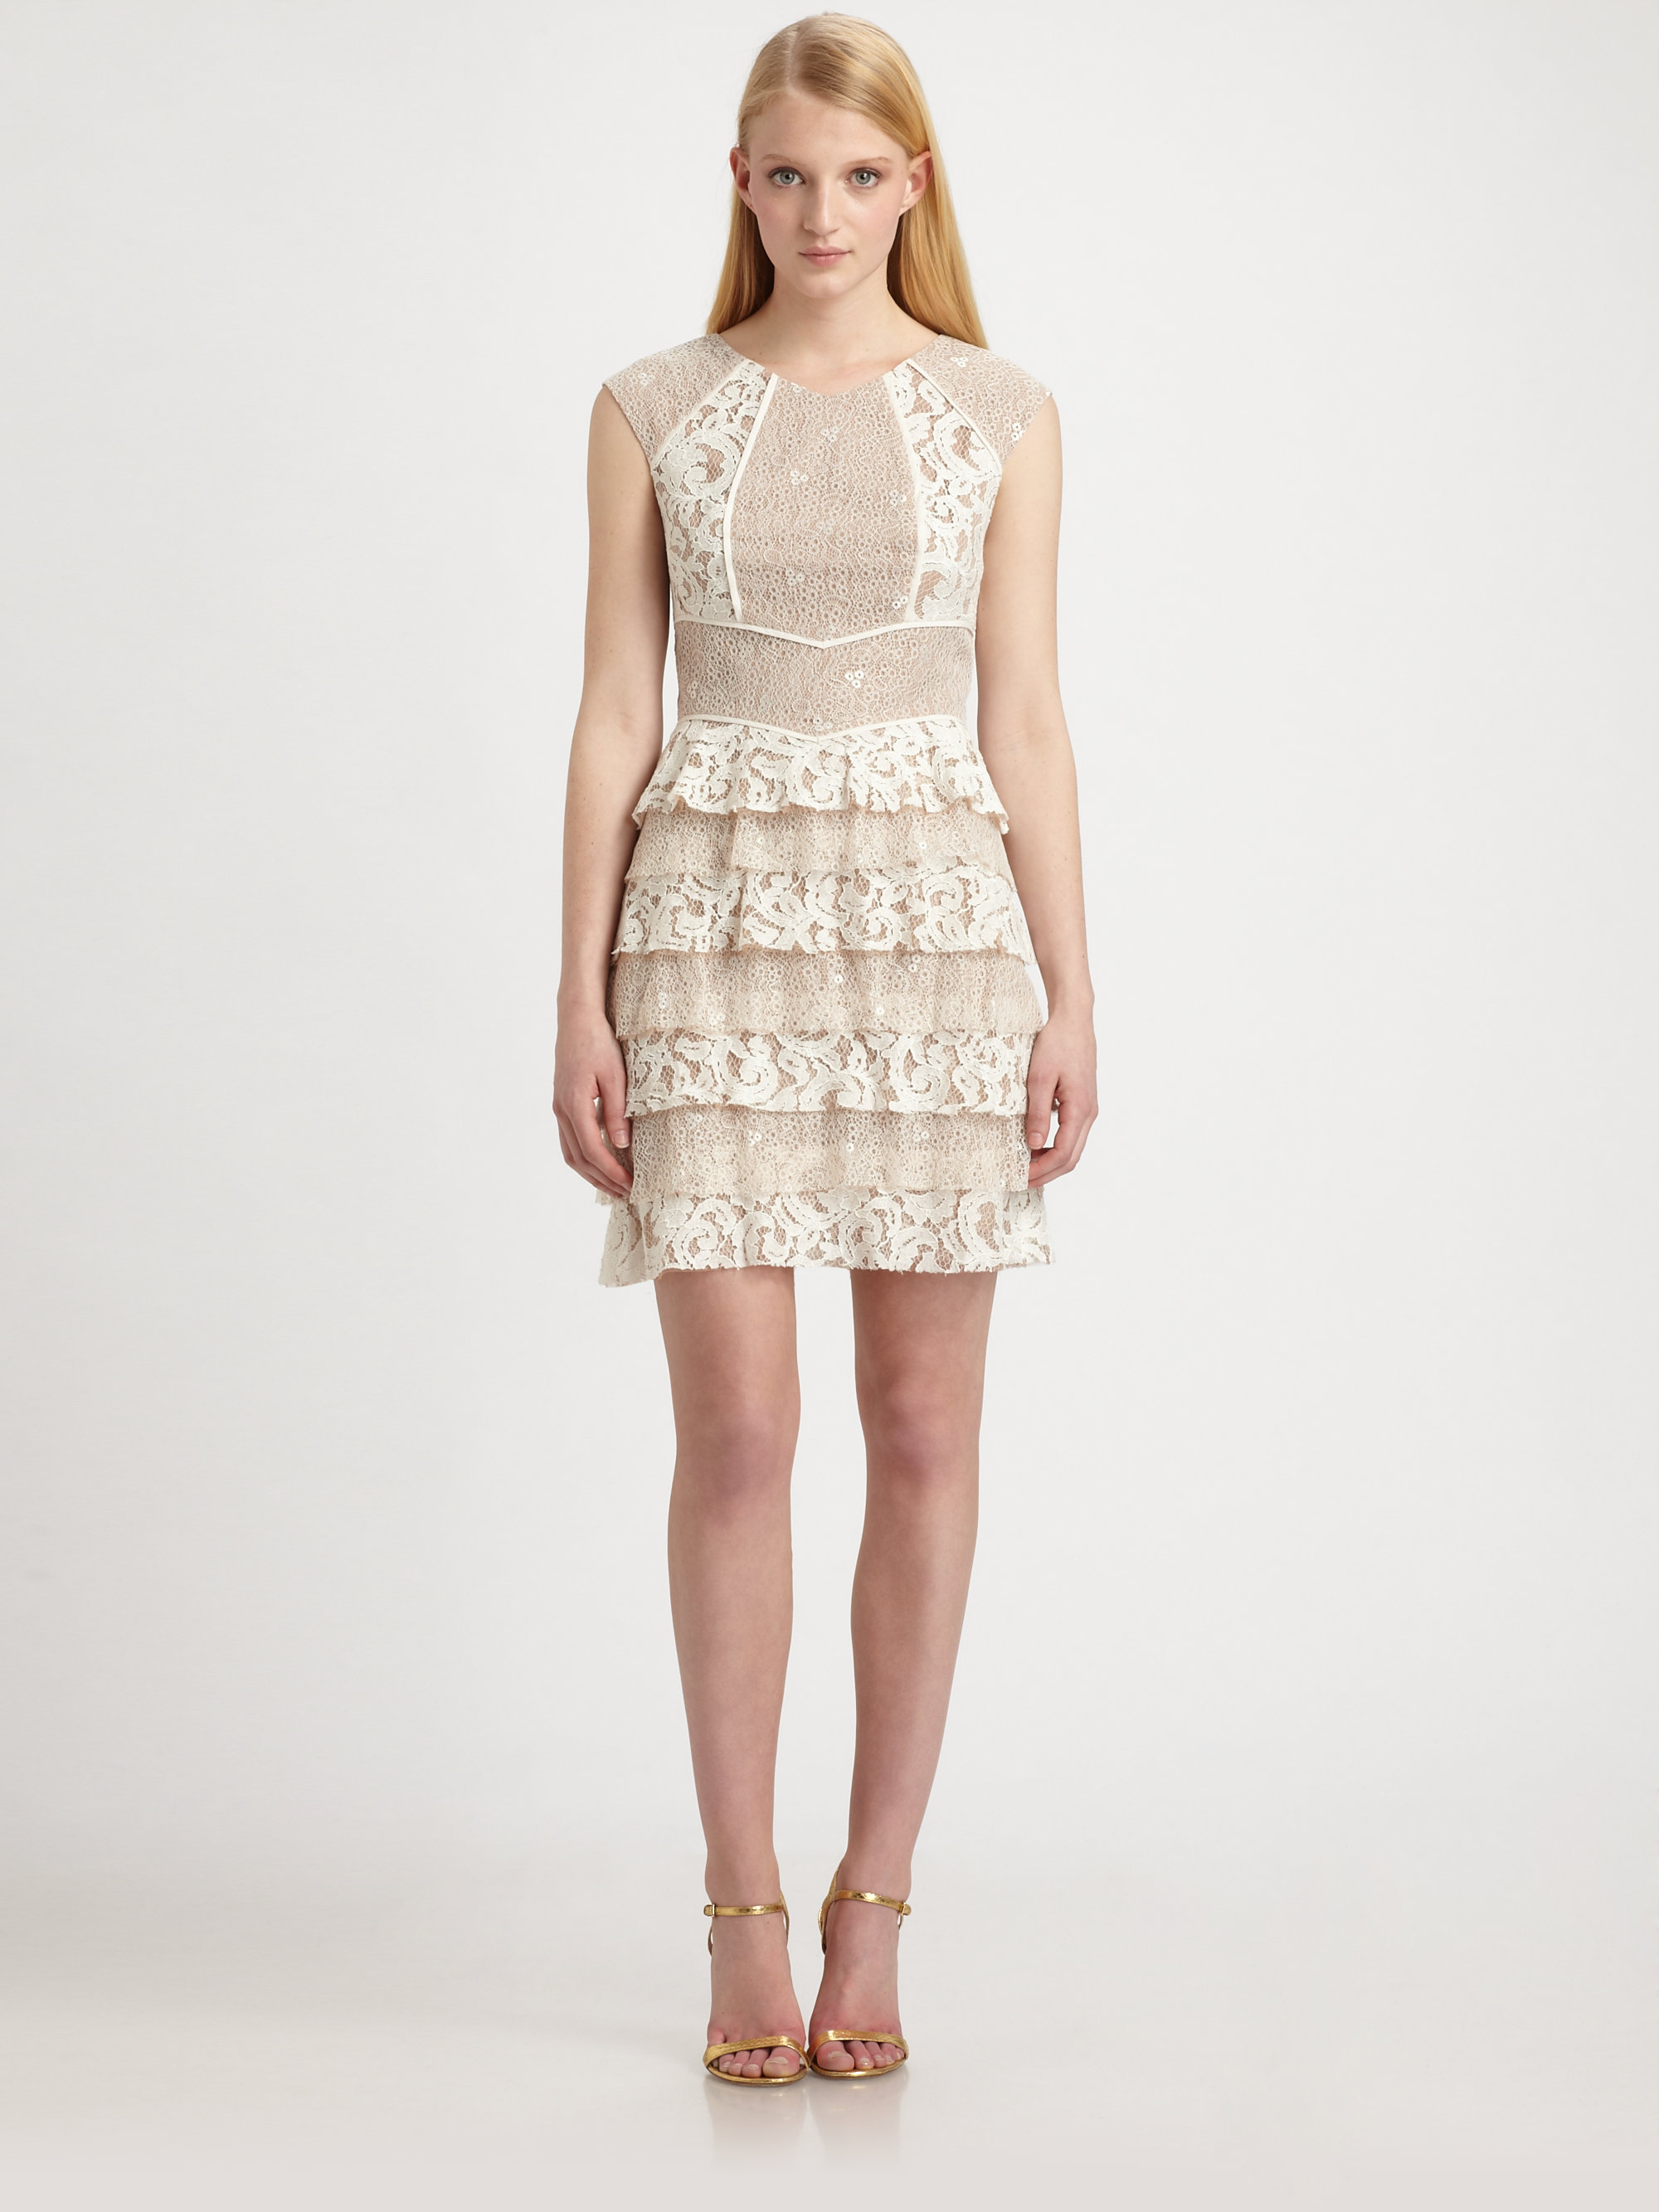 00590a84979 BCBGMAXAZRIA Kayla Lace Dress in Natural - Lyst